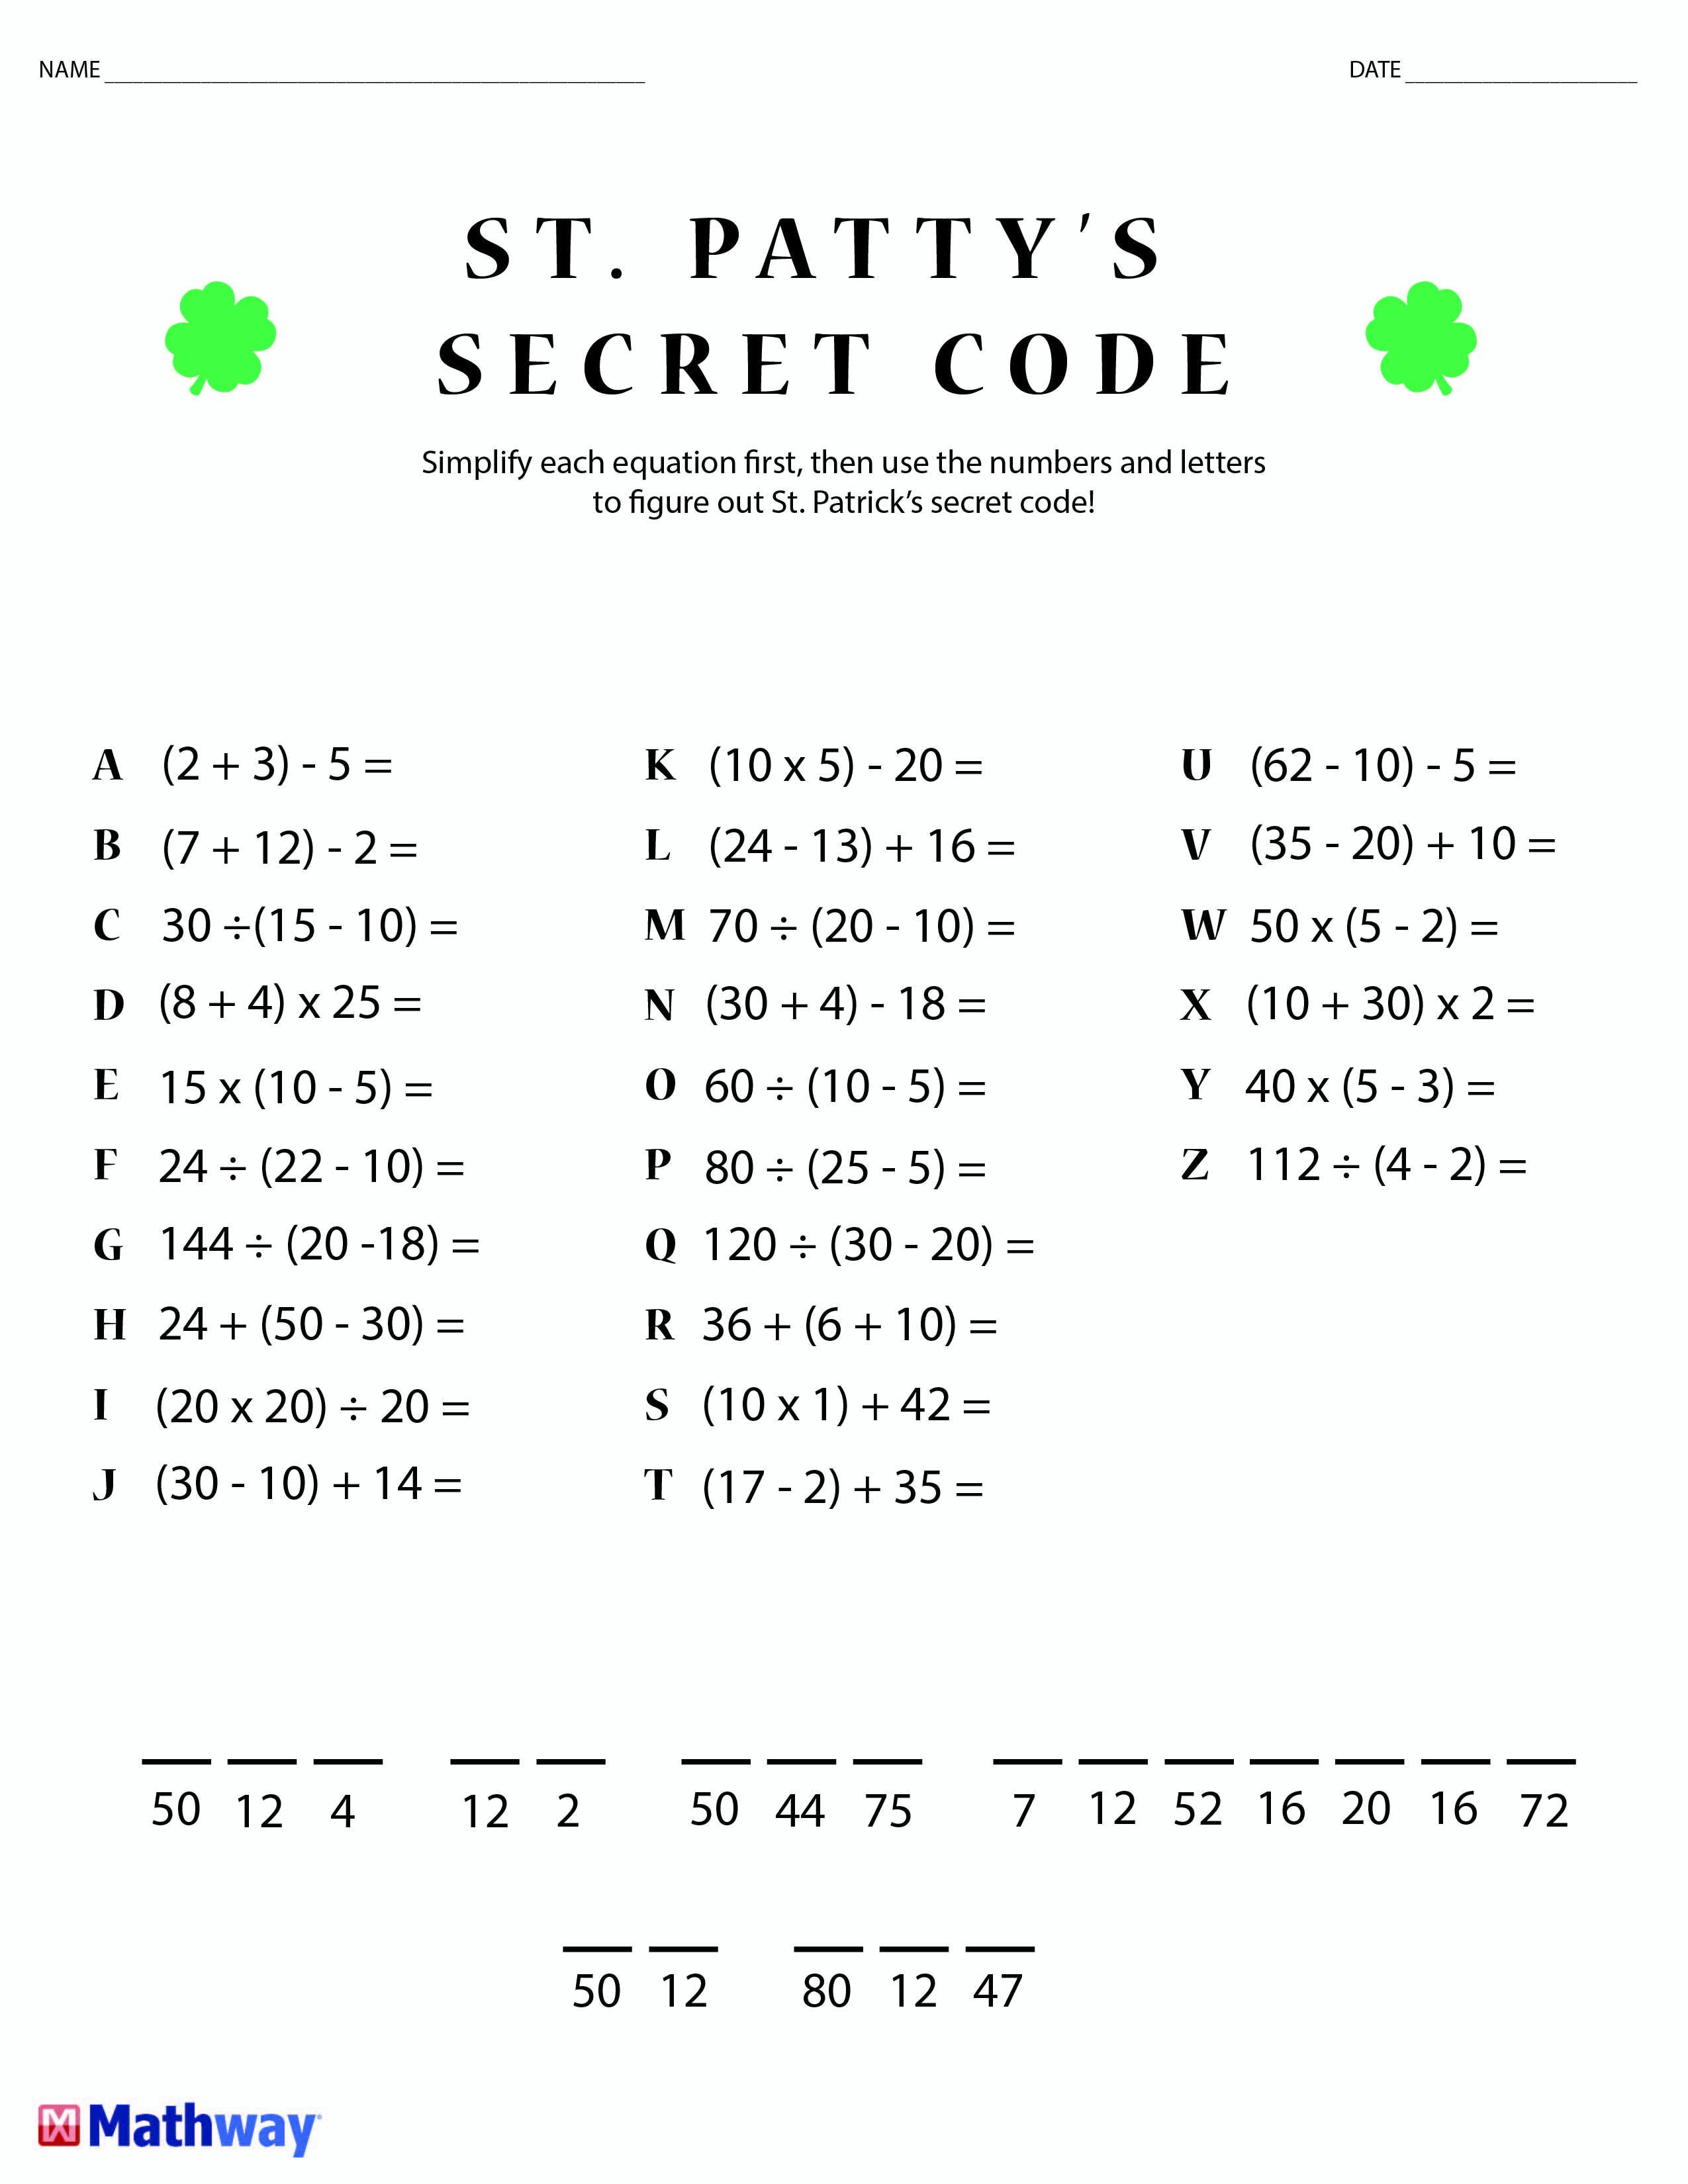 St. Patty's Day Crack The Secret Code Worksheet! Print This One Out | Printable Secret Code Worksheets